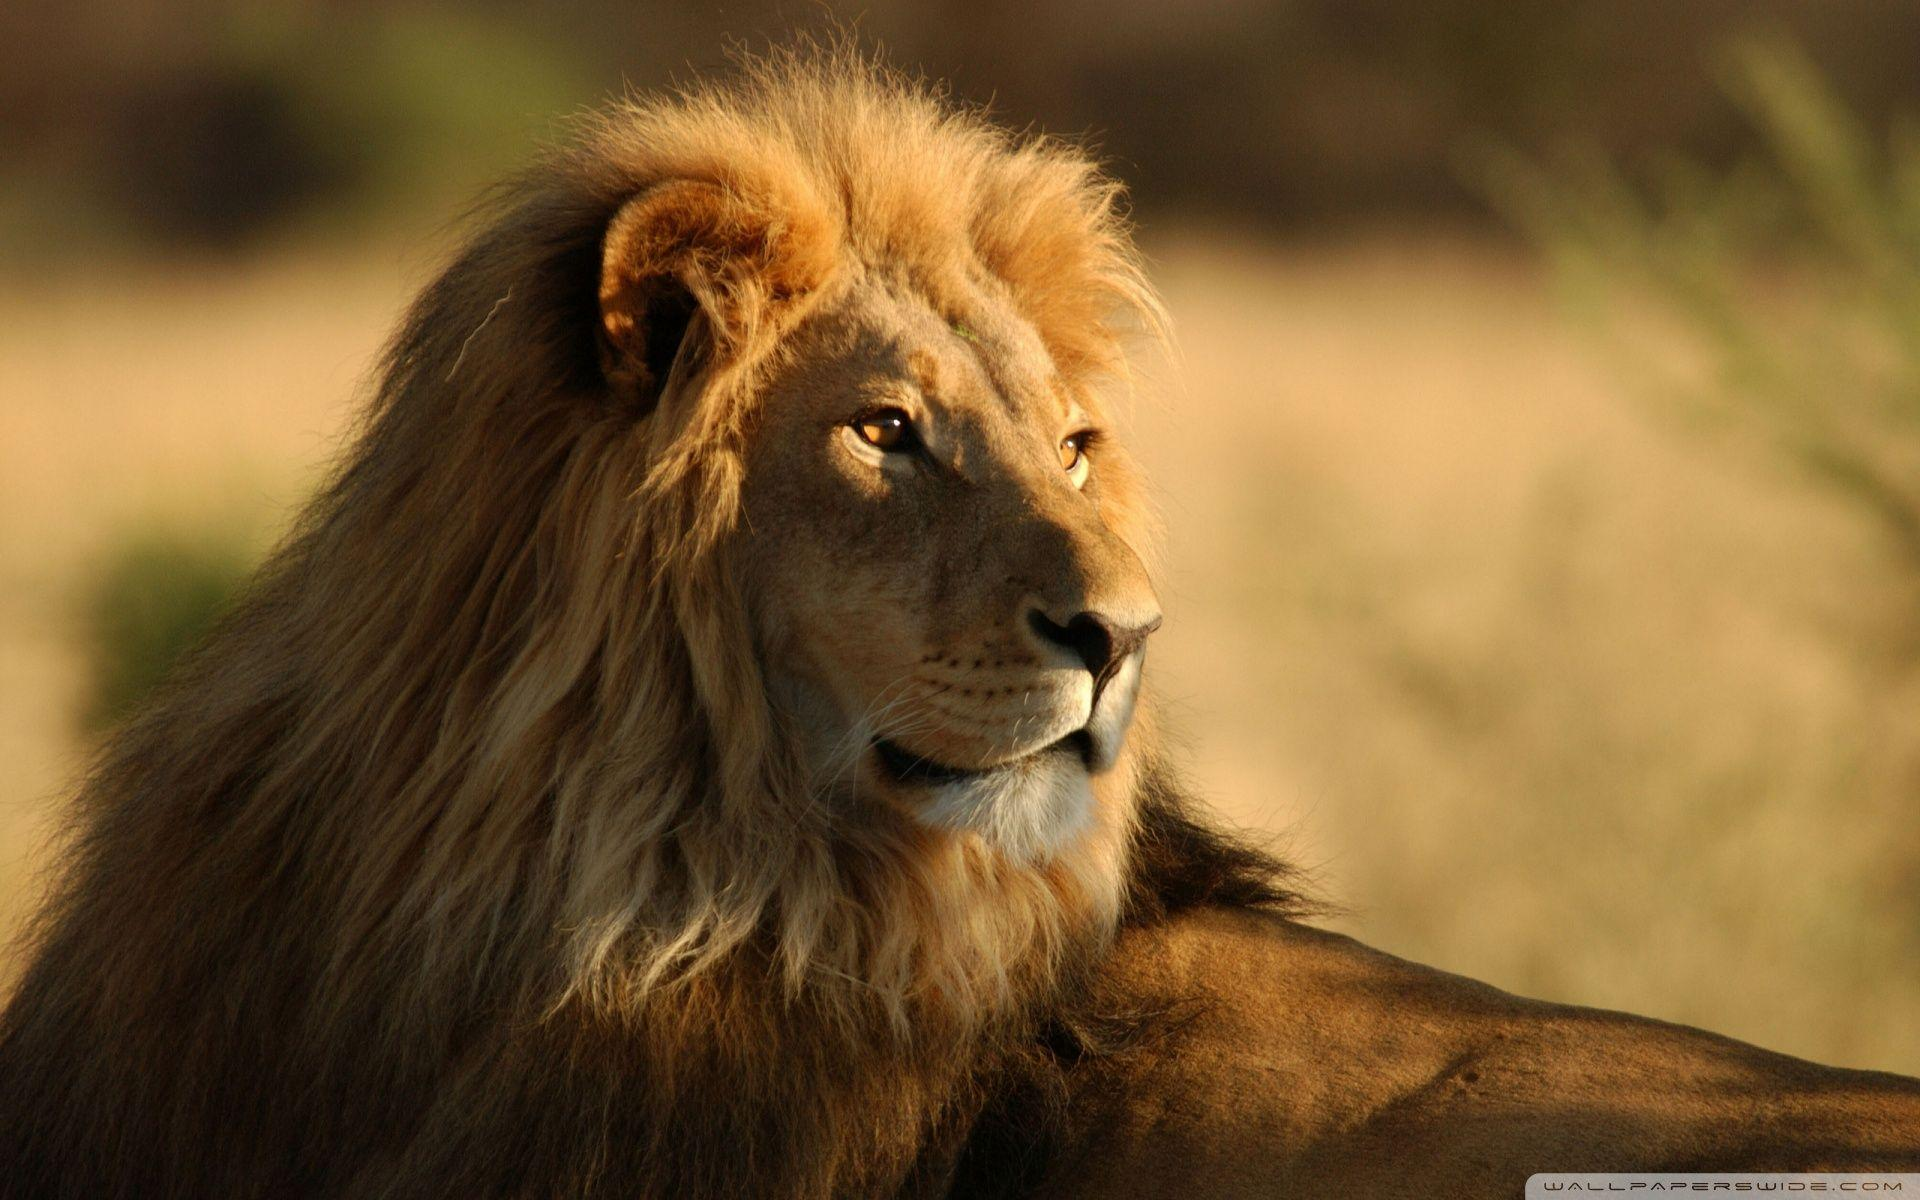 Lion In The Wild HD desktop wallpaper : High Definition ...